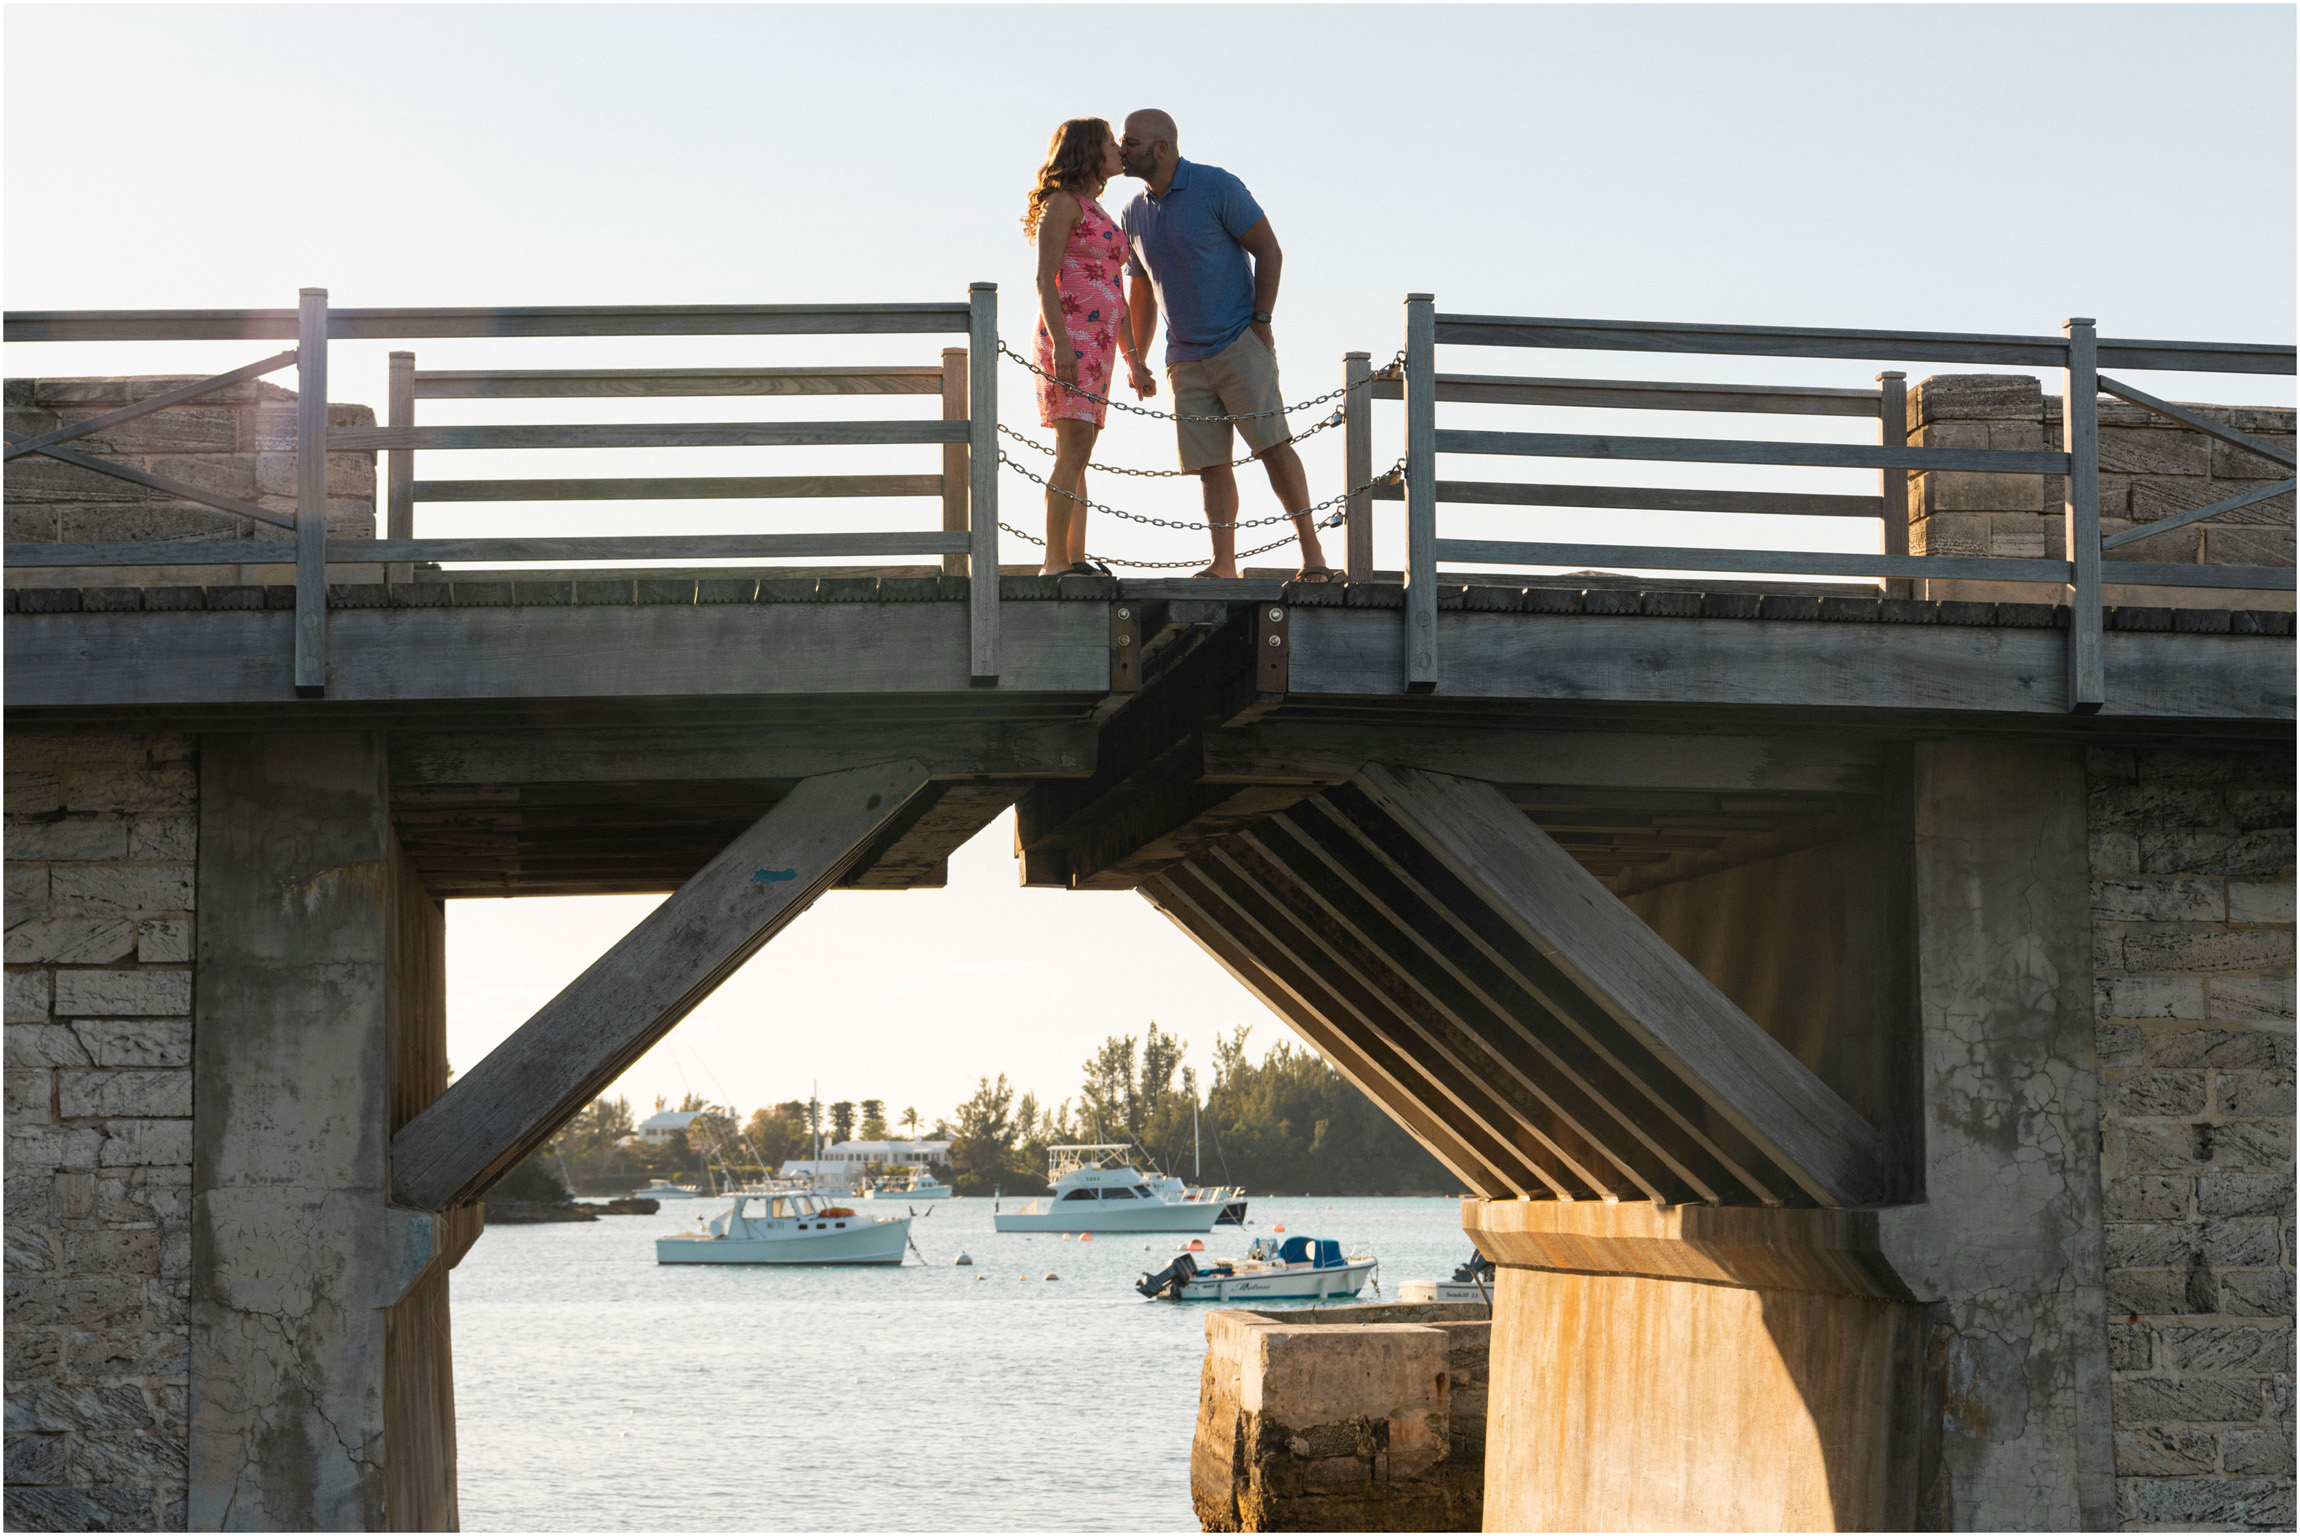 ©FianderFoto_Bermuda Maternity Photographer_Elys Harbour_Ft Scaur_Airbnb_Victoria_Mike_002.jpg